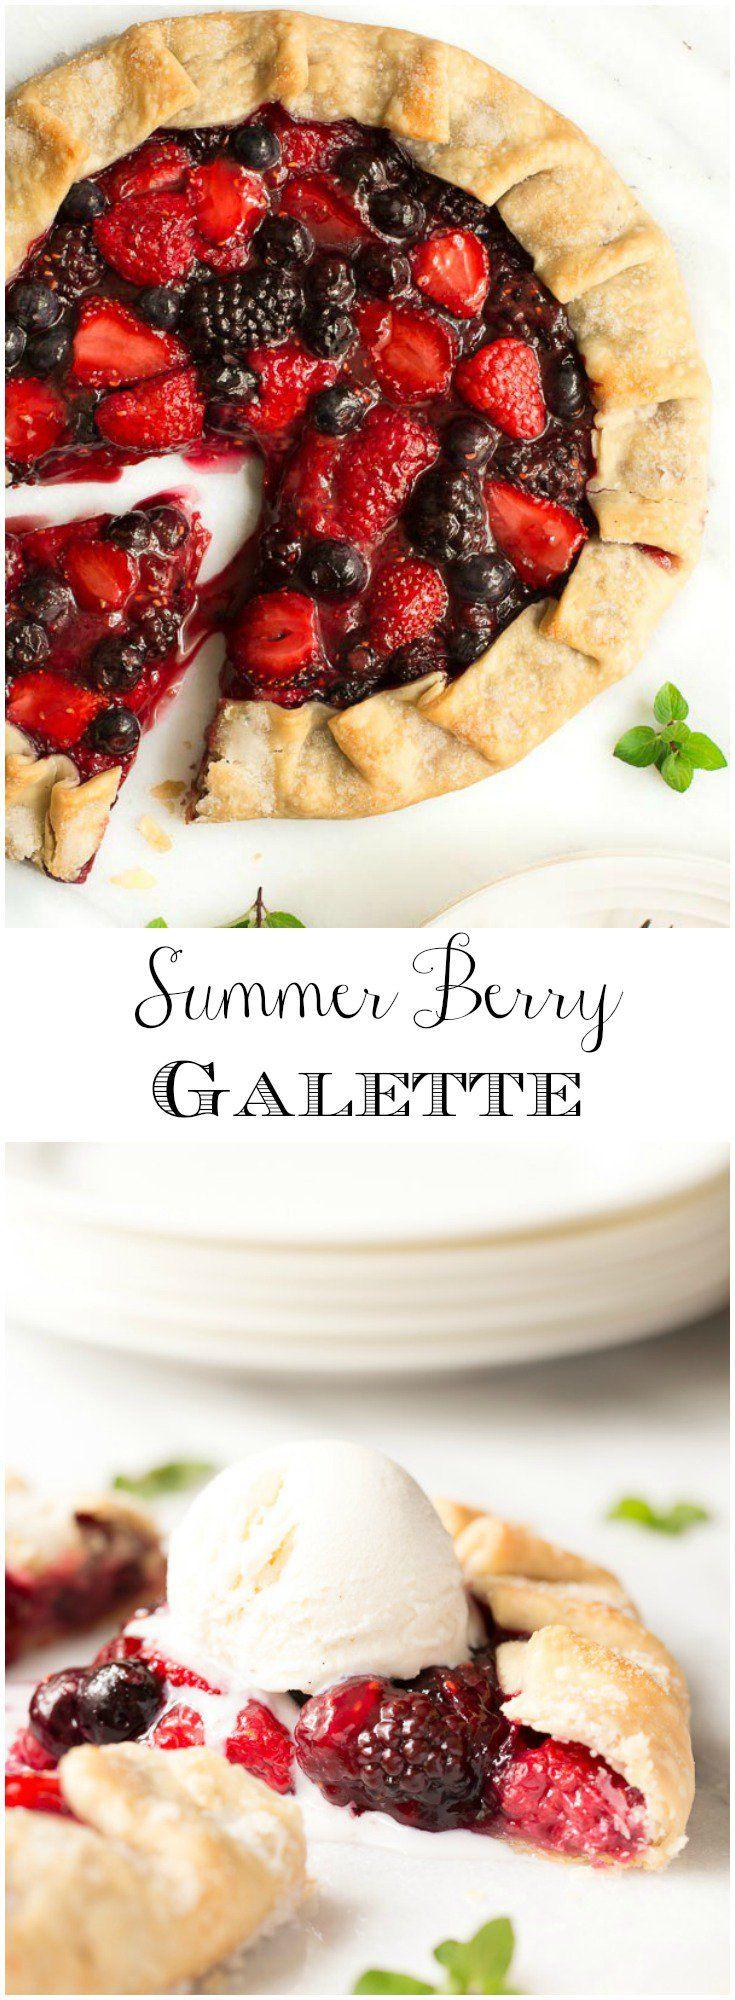 A quick, easy and super delicious summer dessert! via @cafesucrefarine